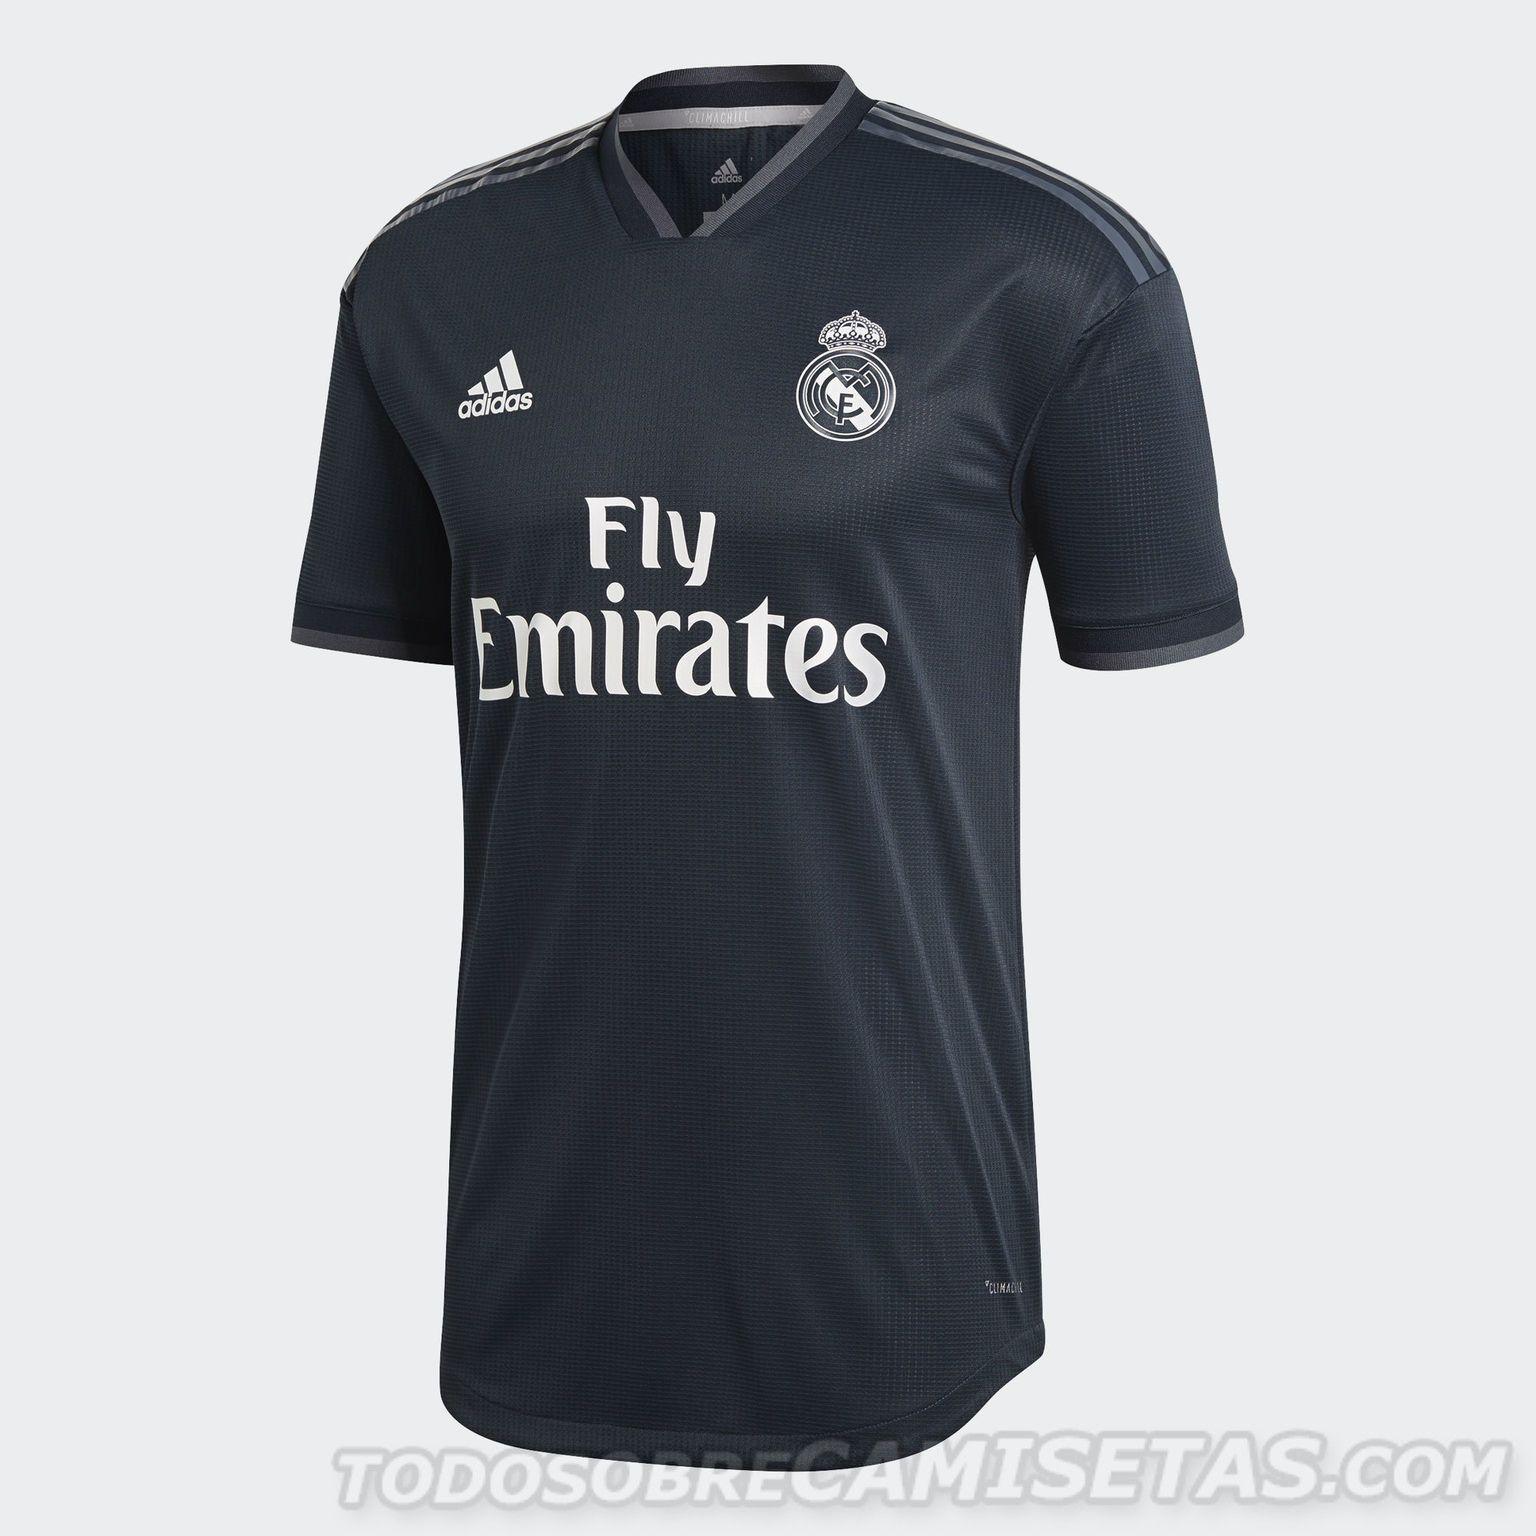 Equipaciones adidas de Real Madrid 2018-19  d332aa0facfb0